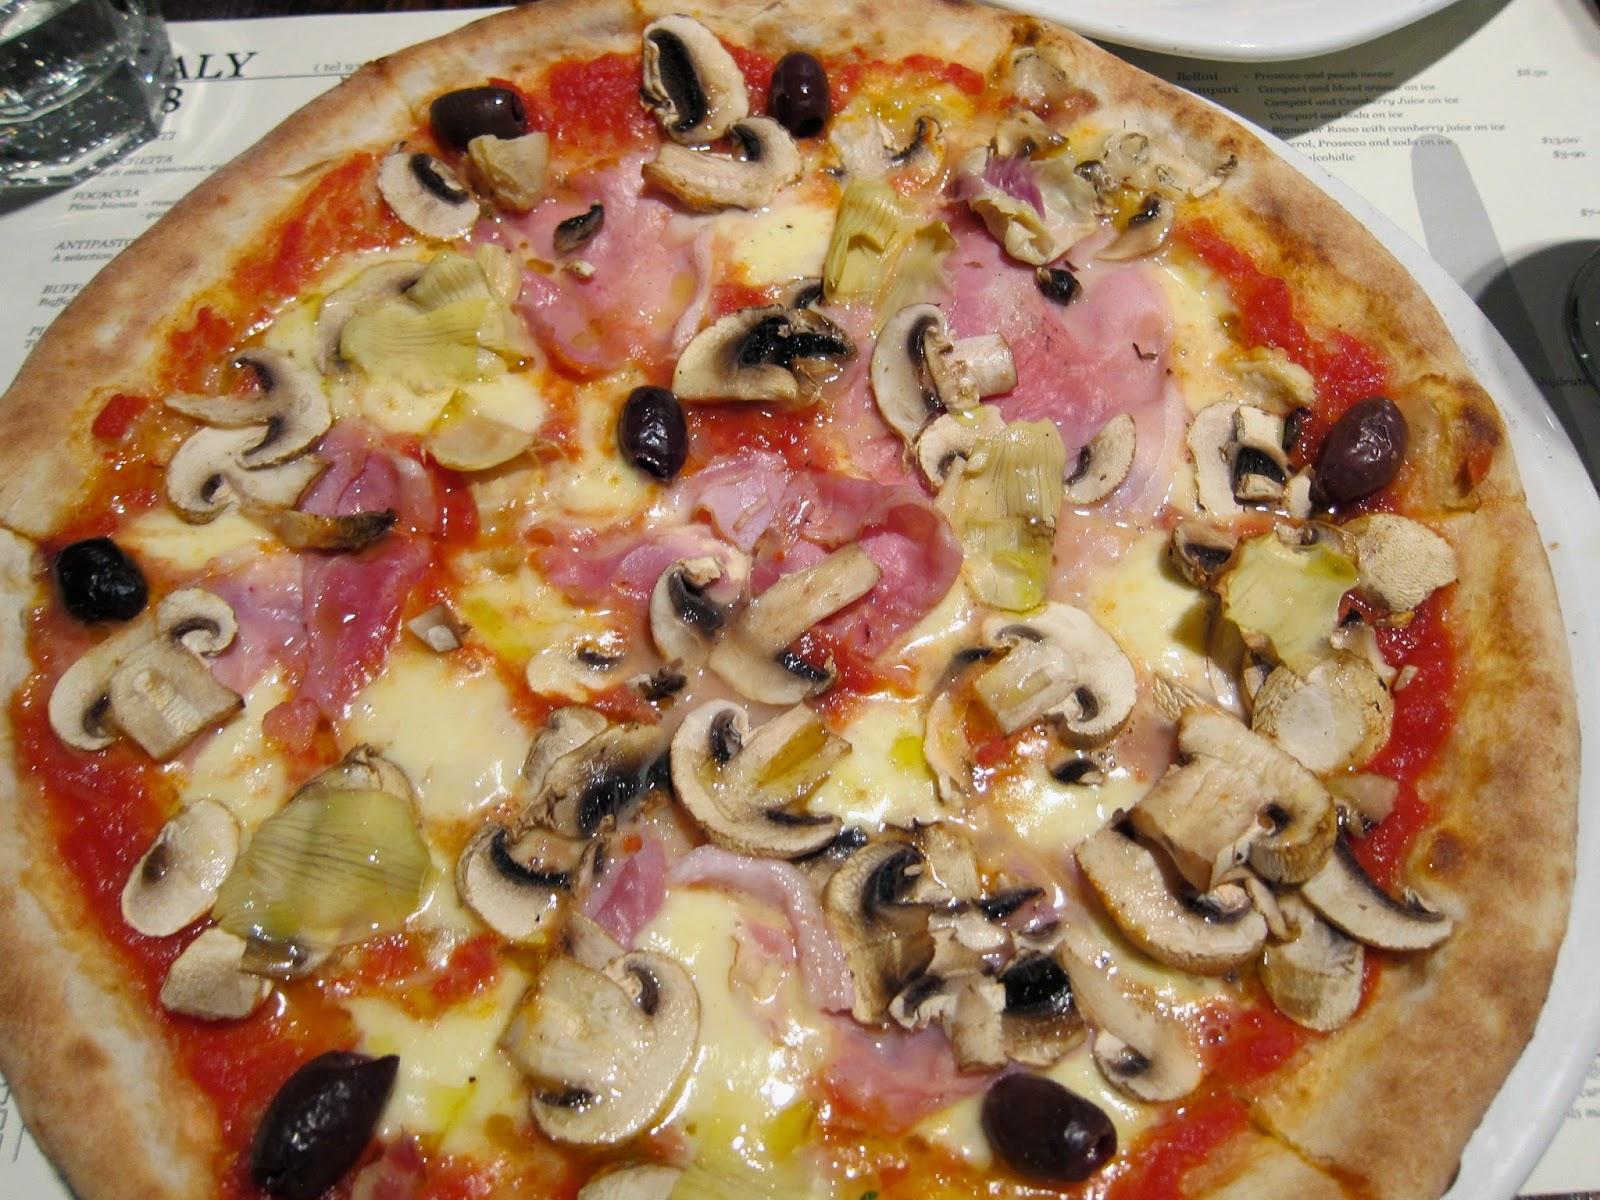 capricciosa pizza italy 528 italian ascot vale